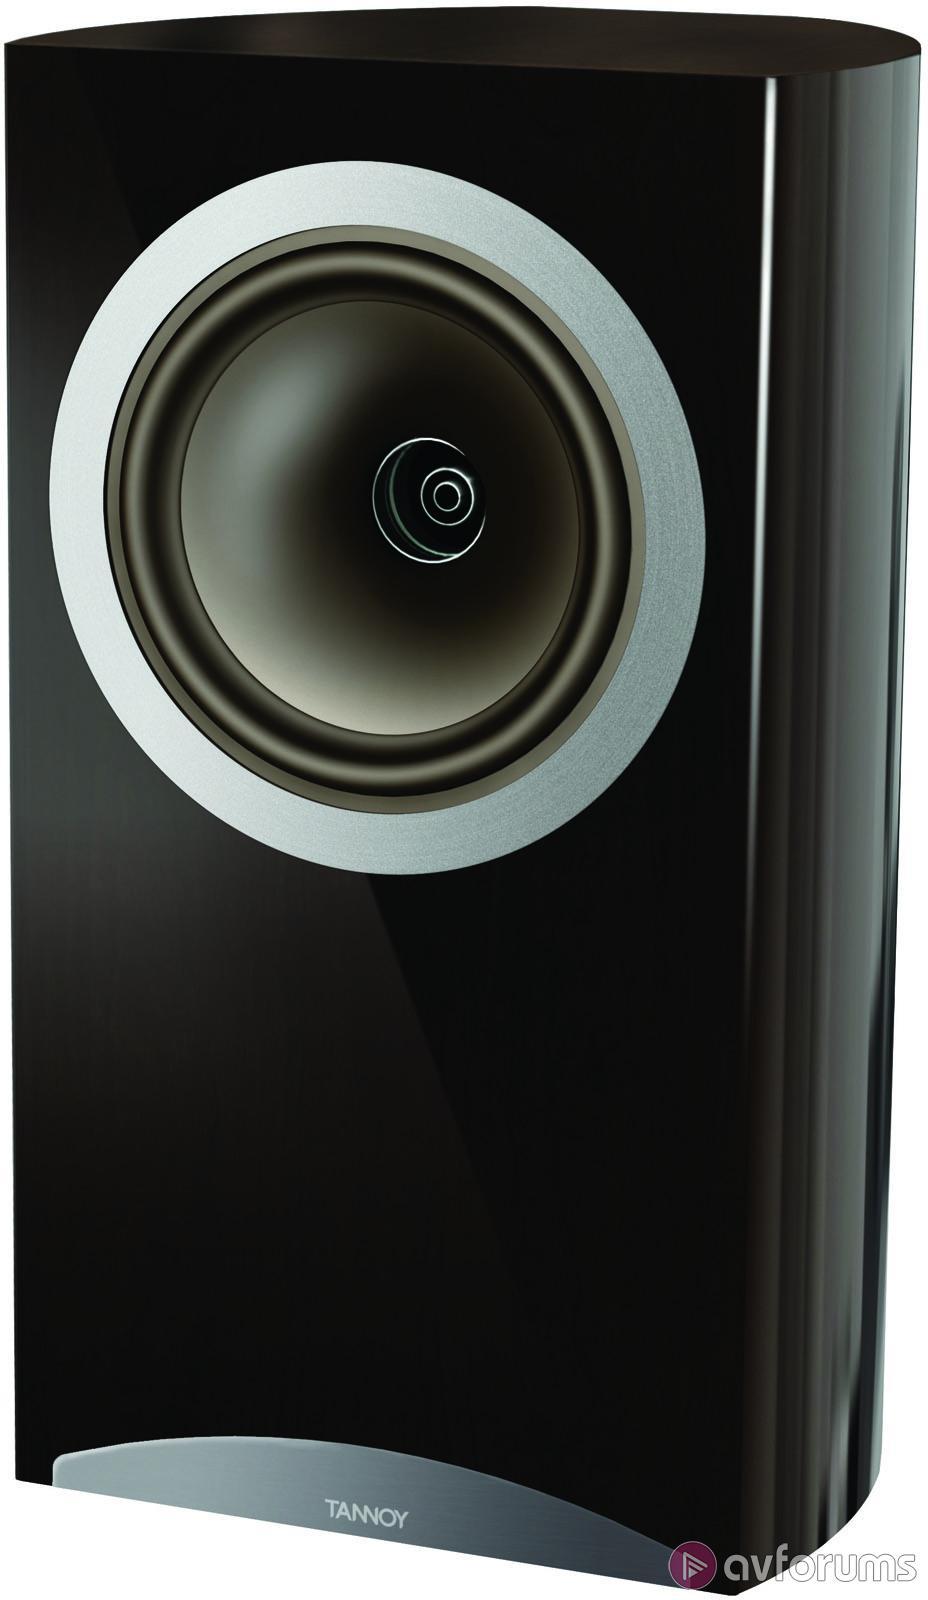 Tannoy DC8 Loudspeakers review